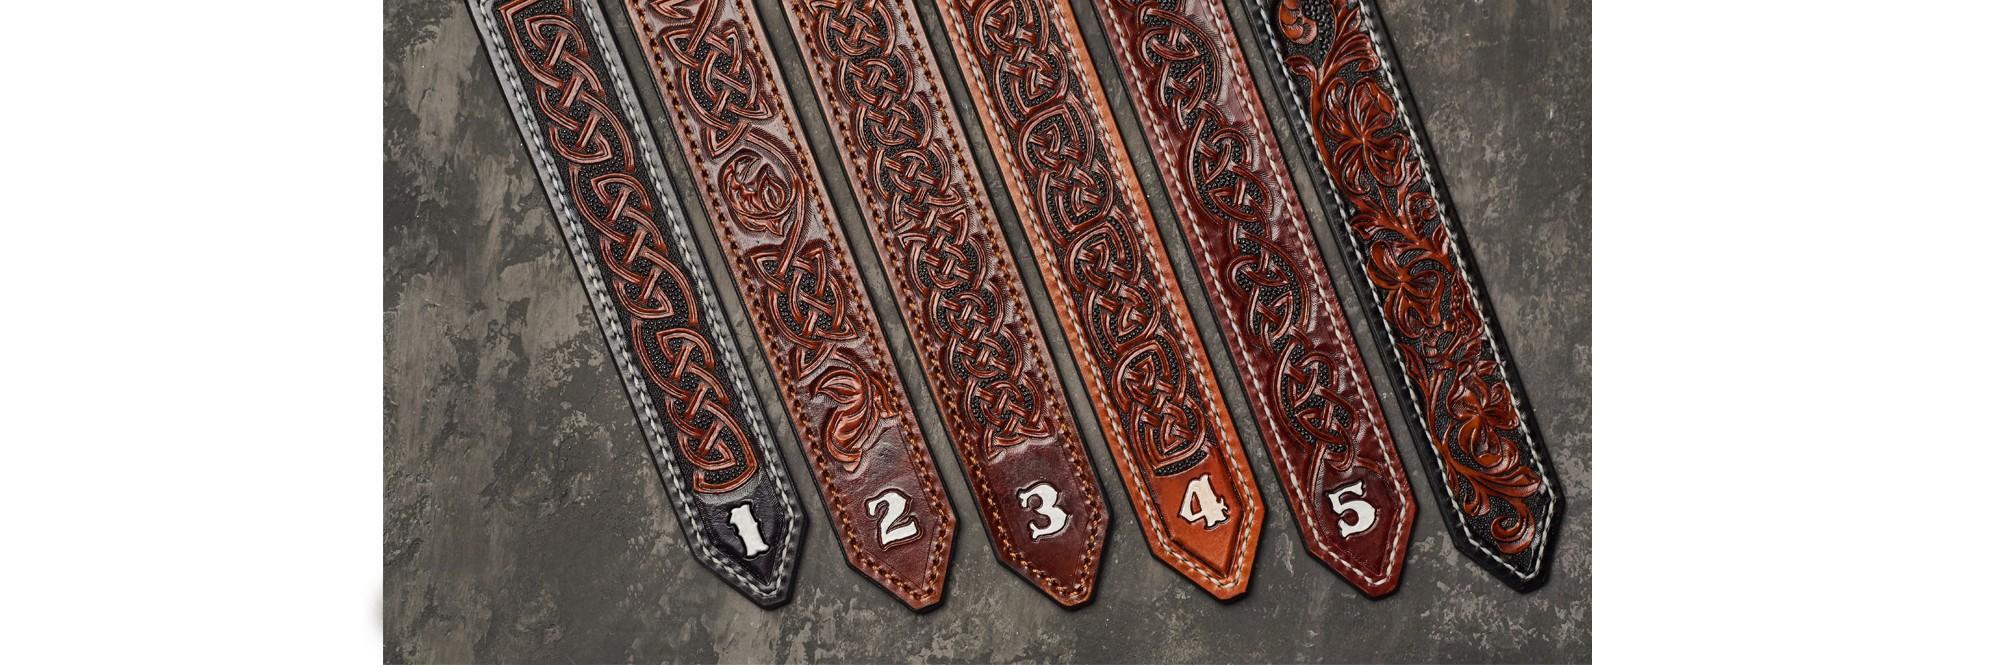 Leather embossed handmade belts